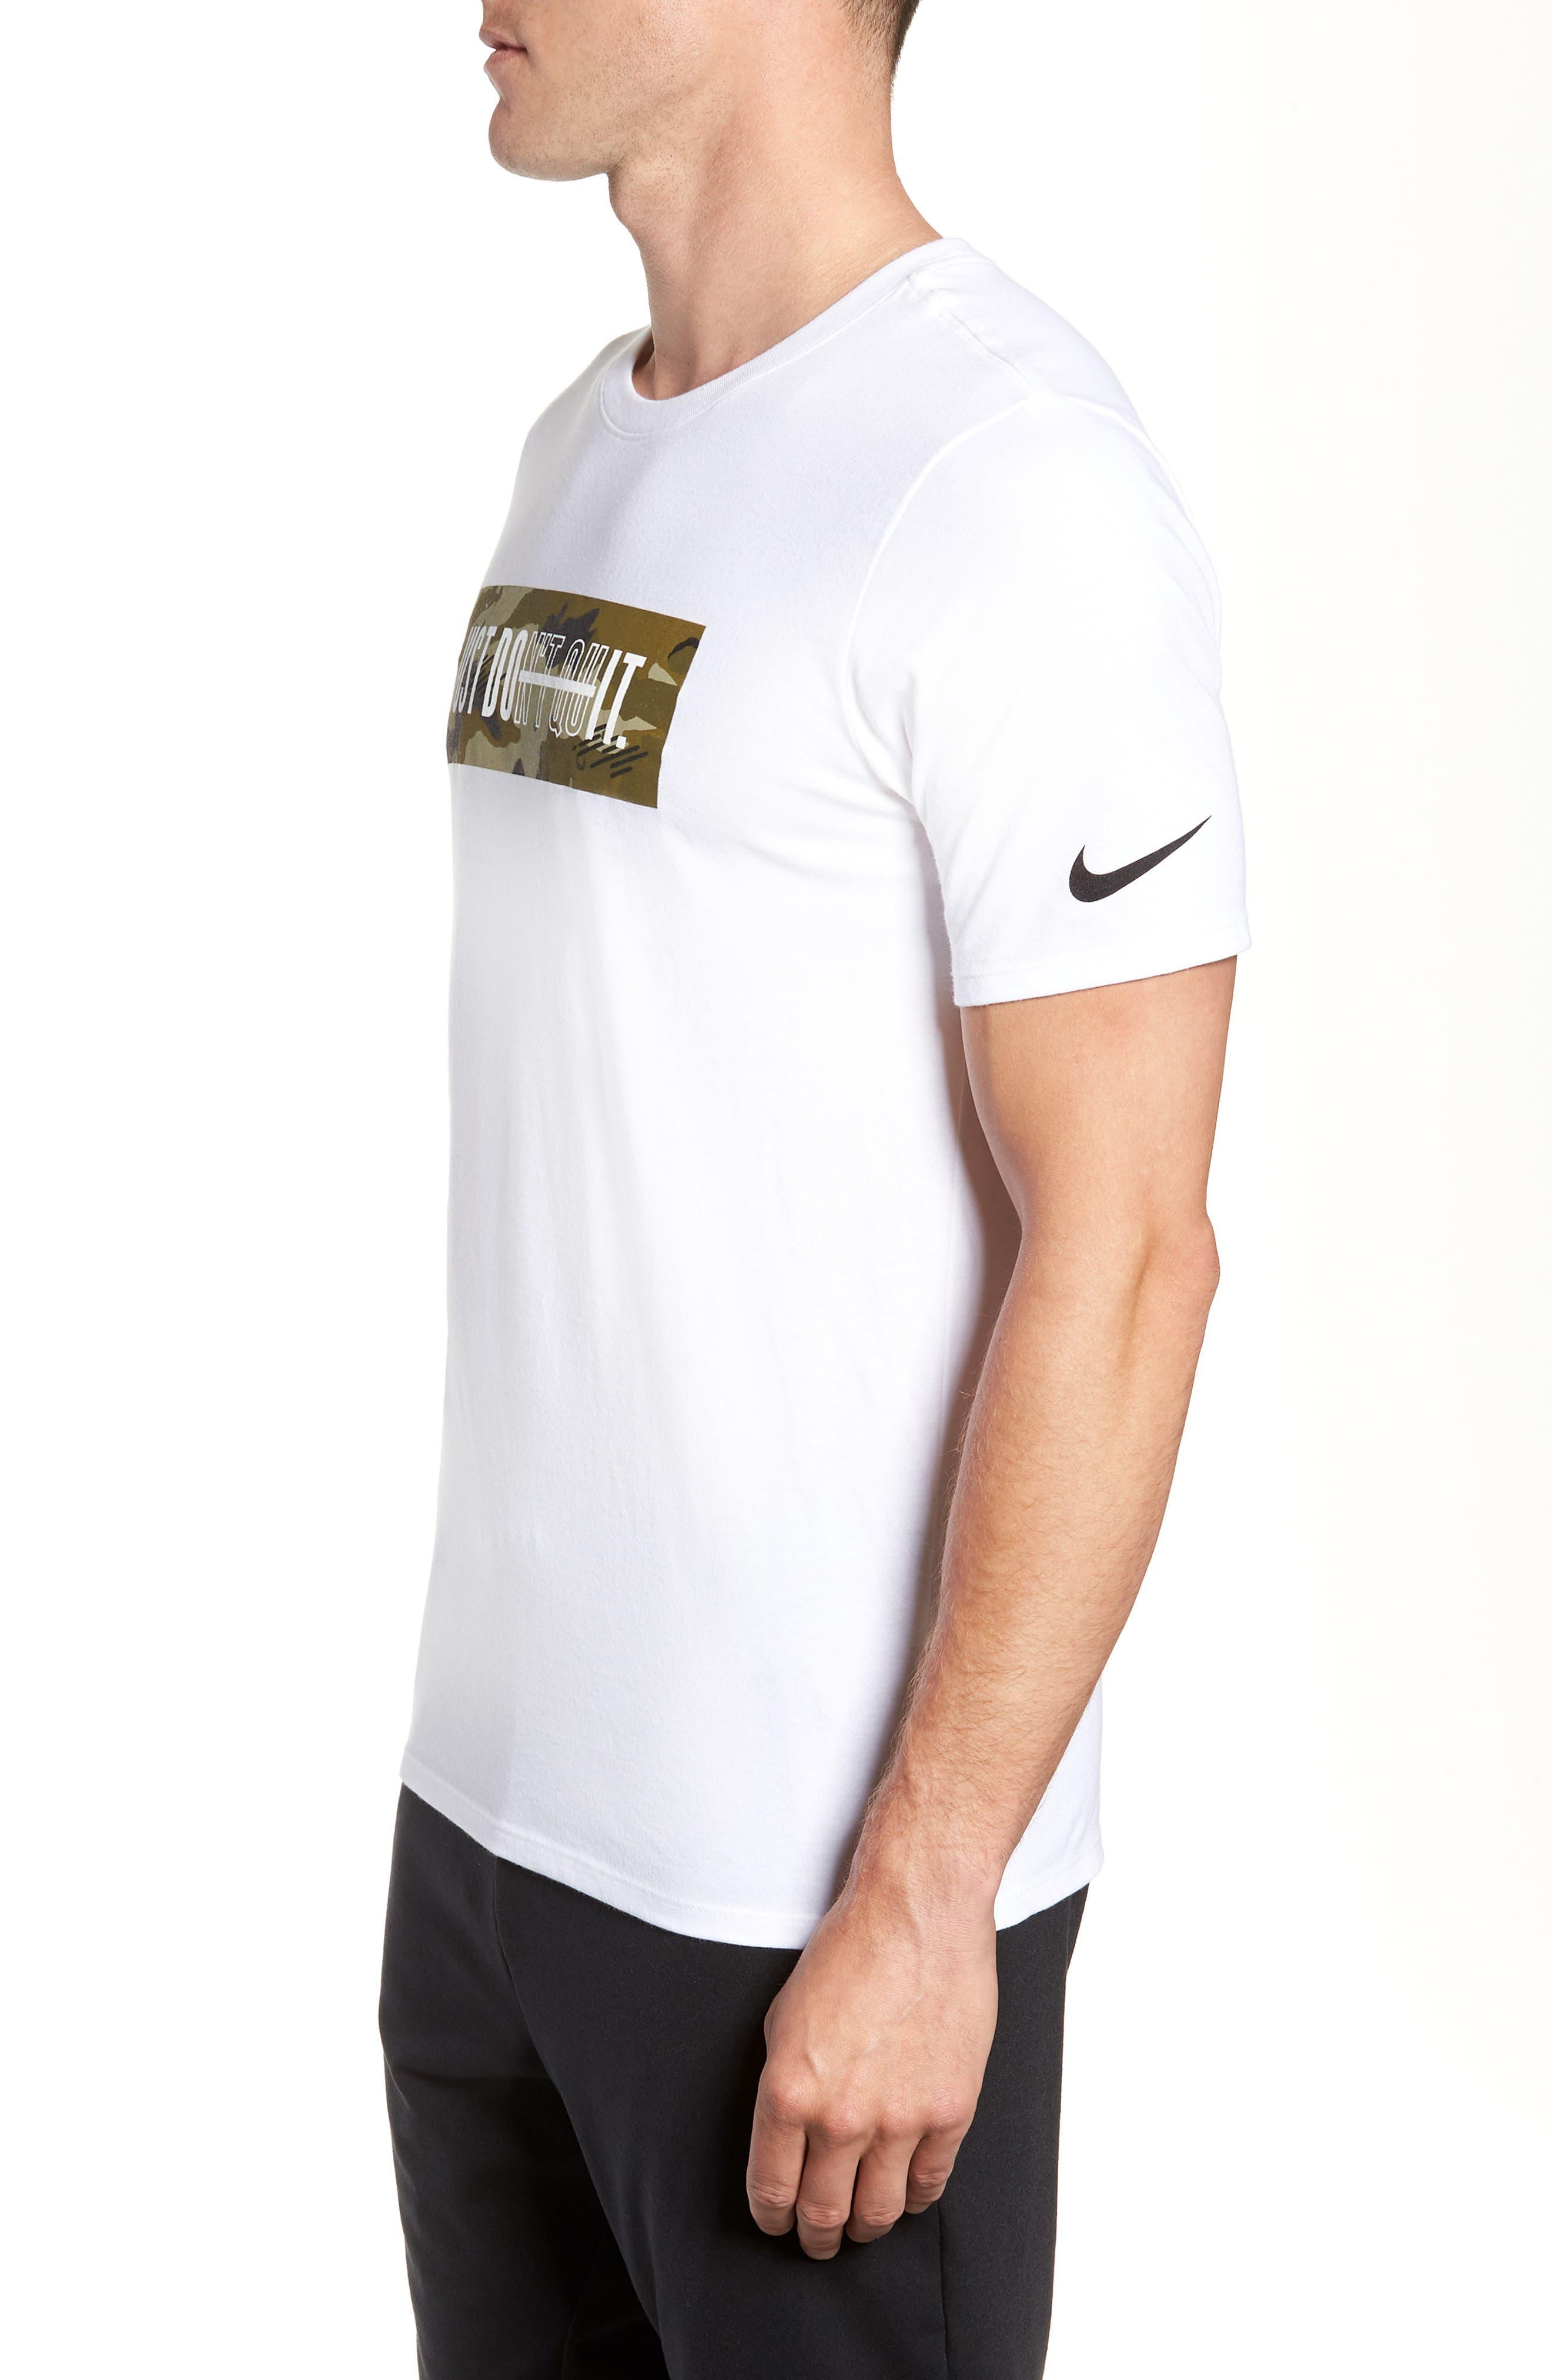 Dry Just Don't Quit T-Shirt,                             Alternate thumbnail 3, color,                             White/ Neutral Olive/ Black